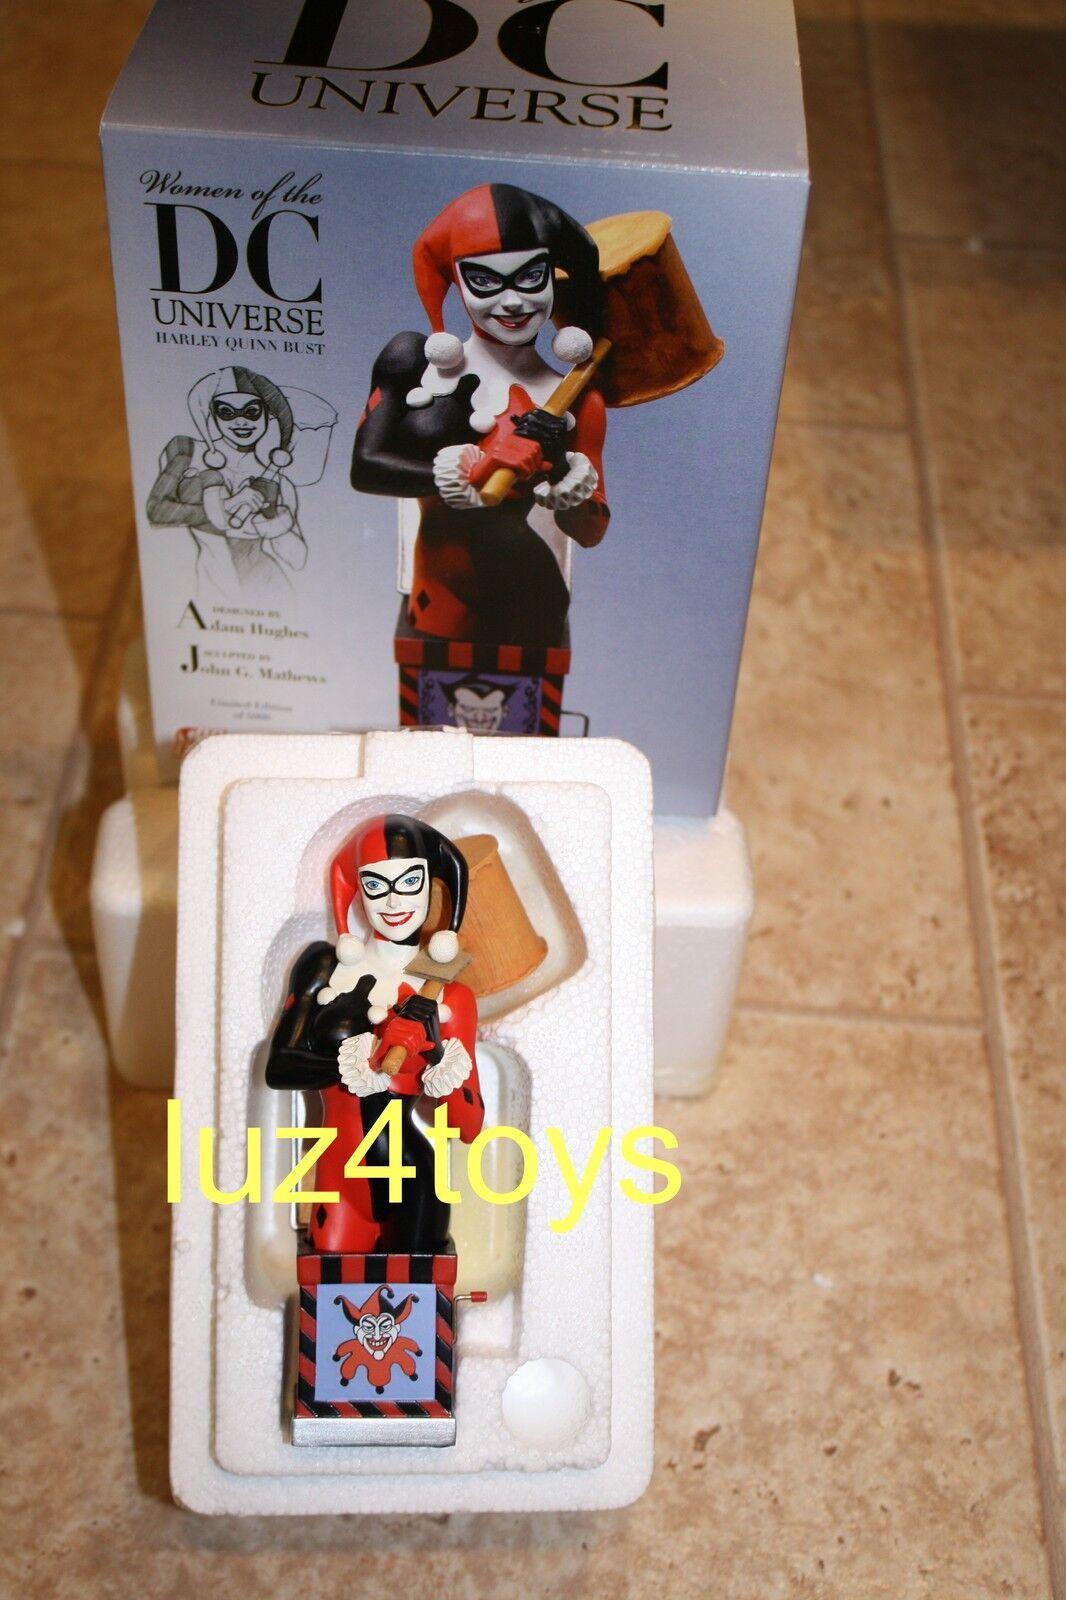 DC Direct Damens of the DC Universe Harley Quinn Bust Series1 Adam Hughes